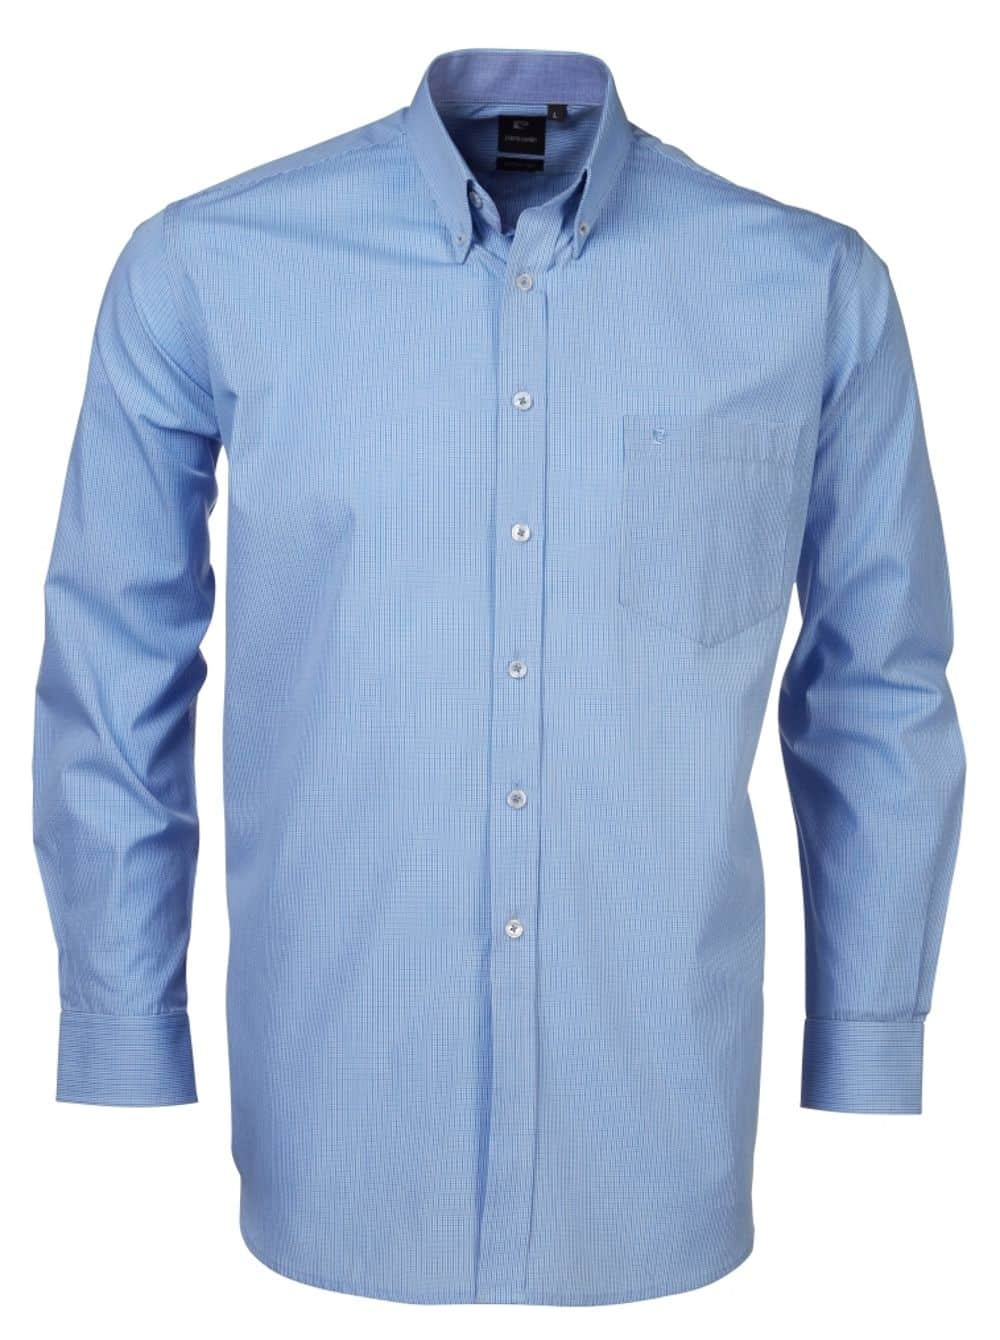 Mens Slimfit PC4 Shirt Lounge Shirts and Blouses